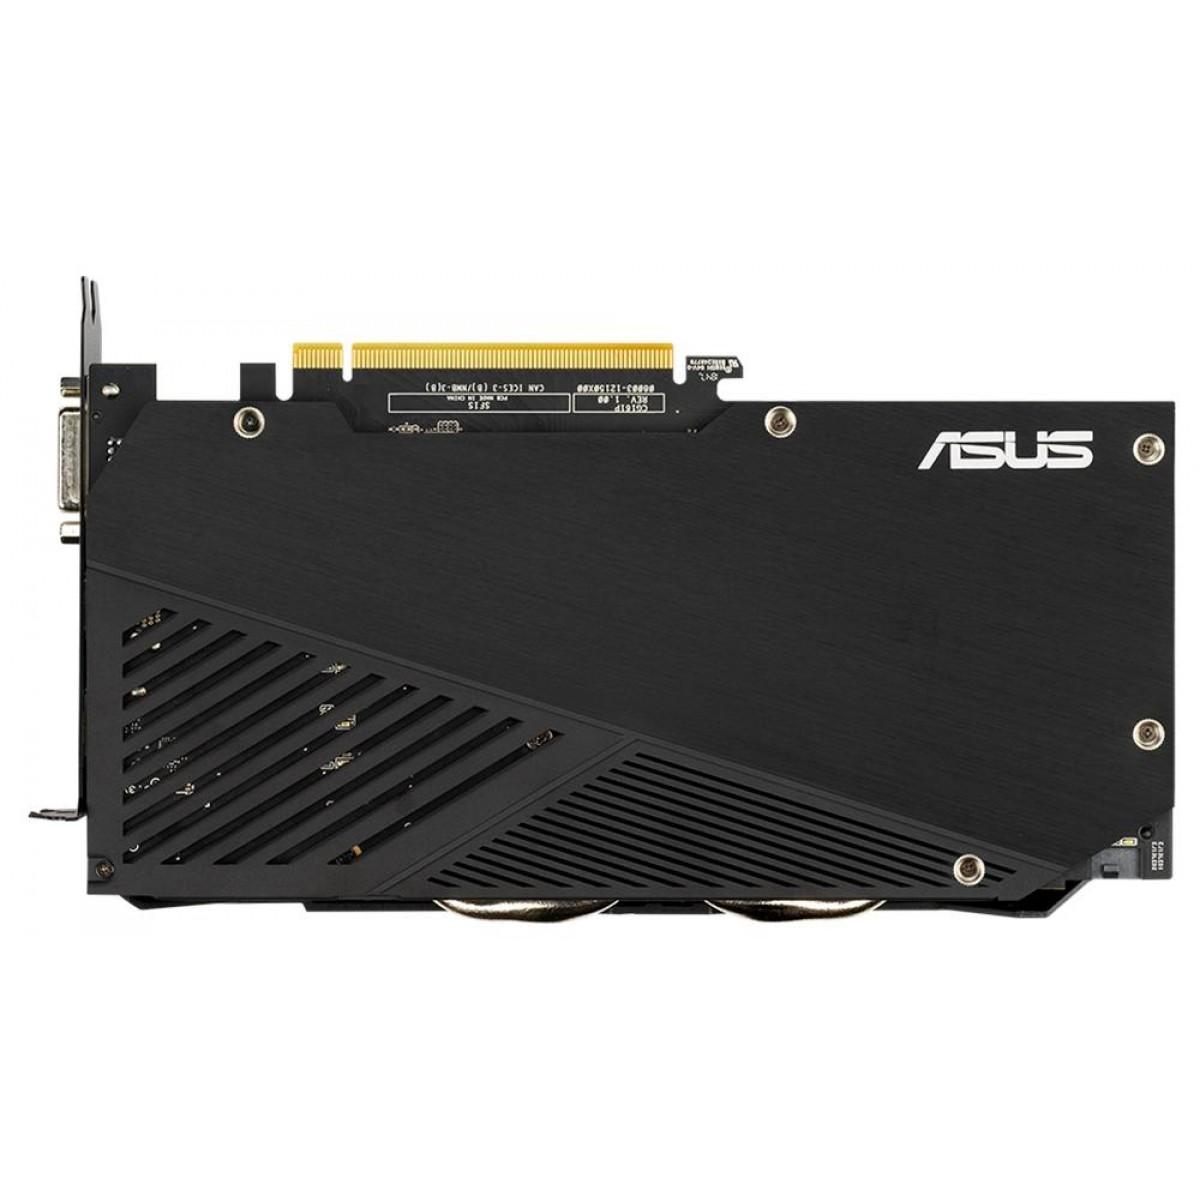 Placa de Vídeo Asus, GeForce, RTX 2060 Super Evo V2 Dual, 8GB, GDDR6, 256Bit, DUAL-RTX2060S-8G-EVO-V2